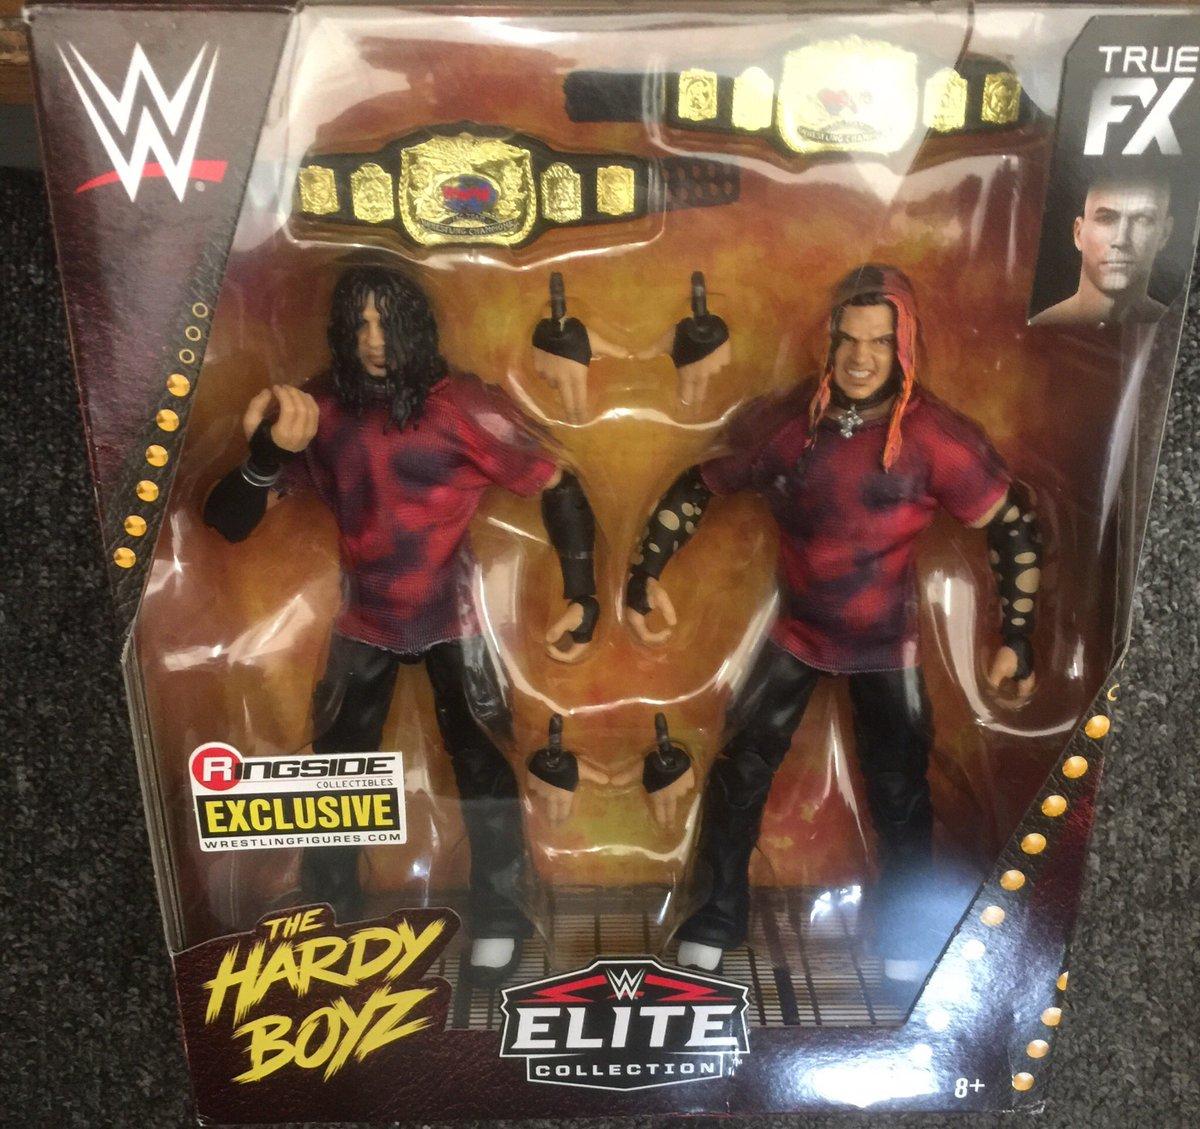 More for the collection thanks to @wrestlingtrader #Hardyz #HardyBoyz